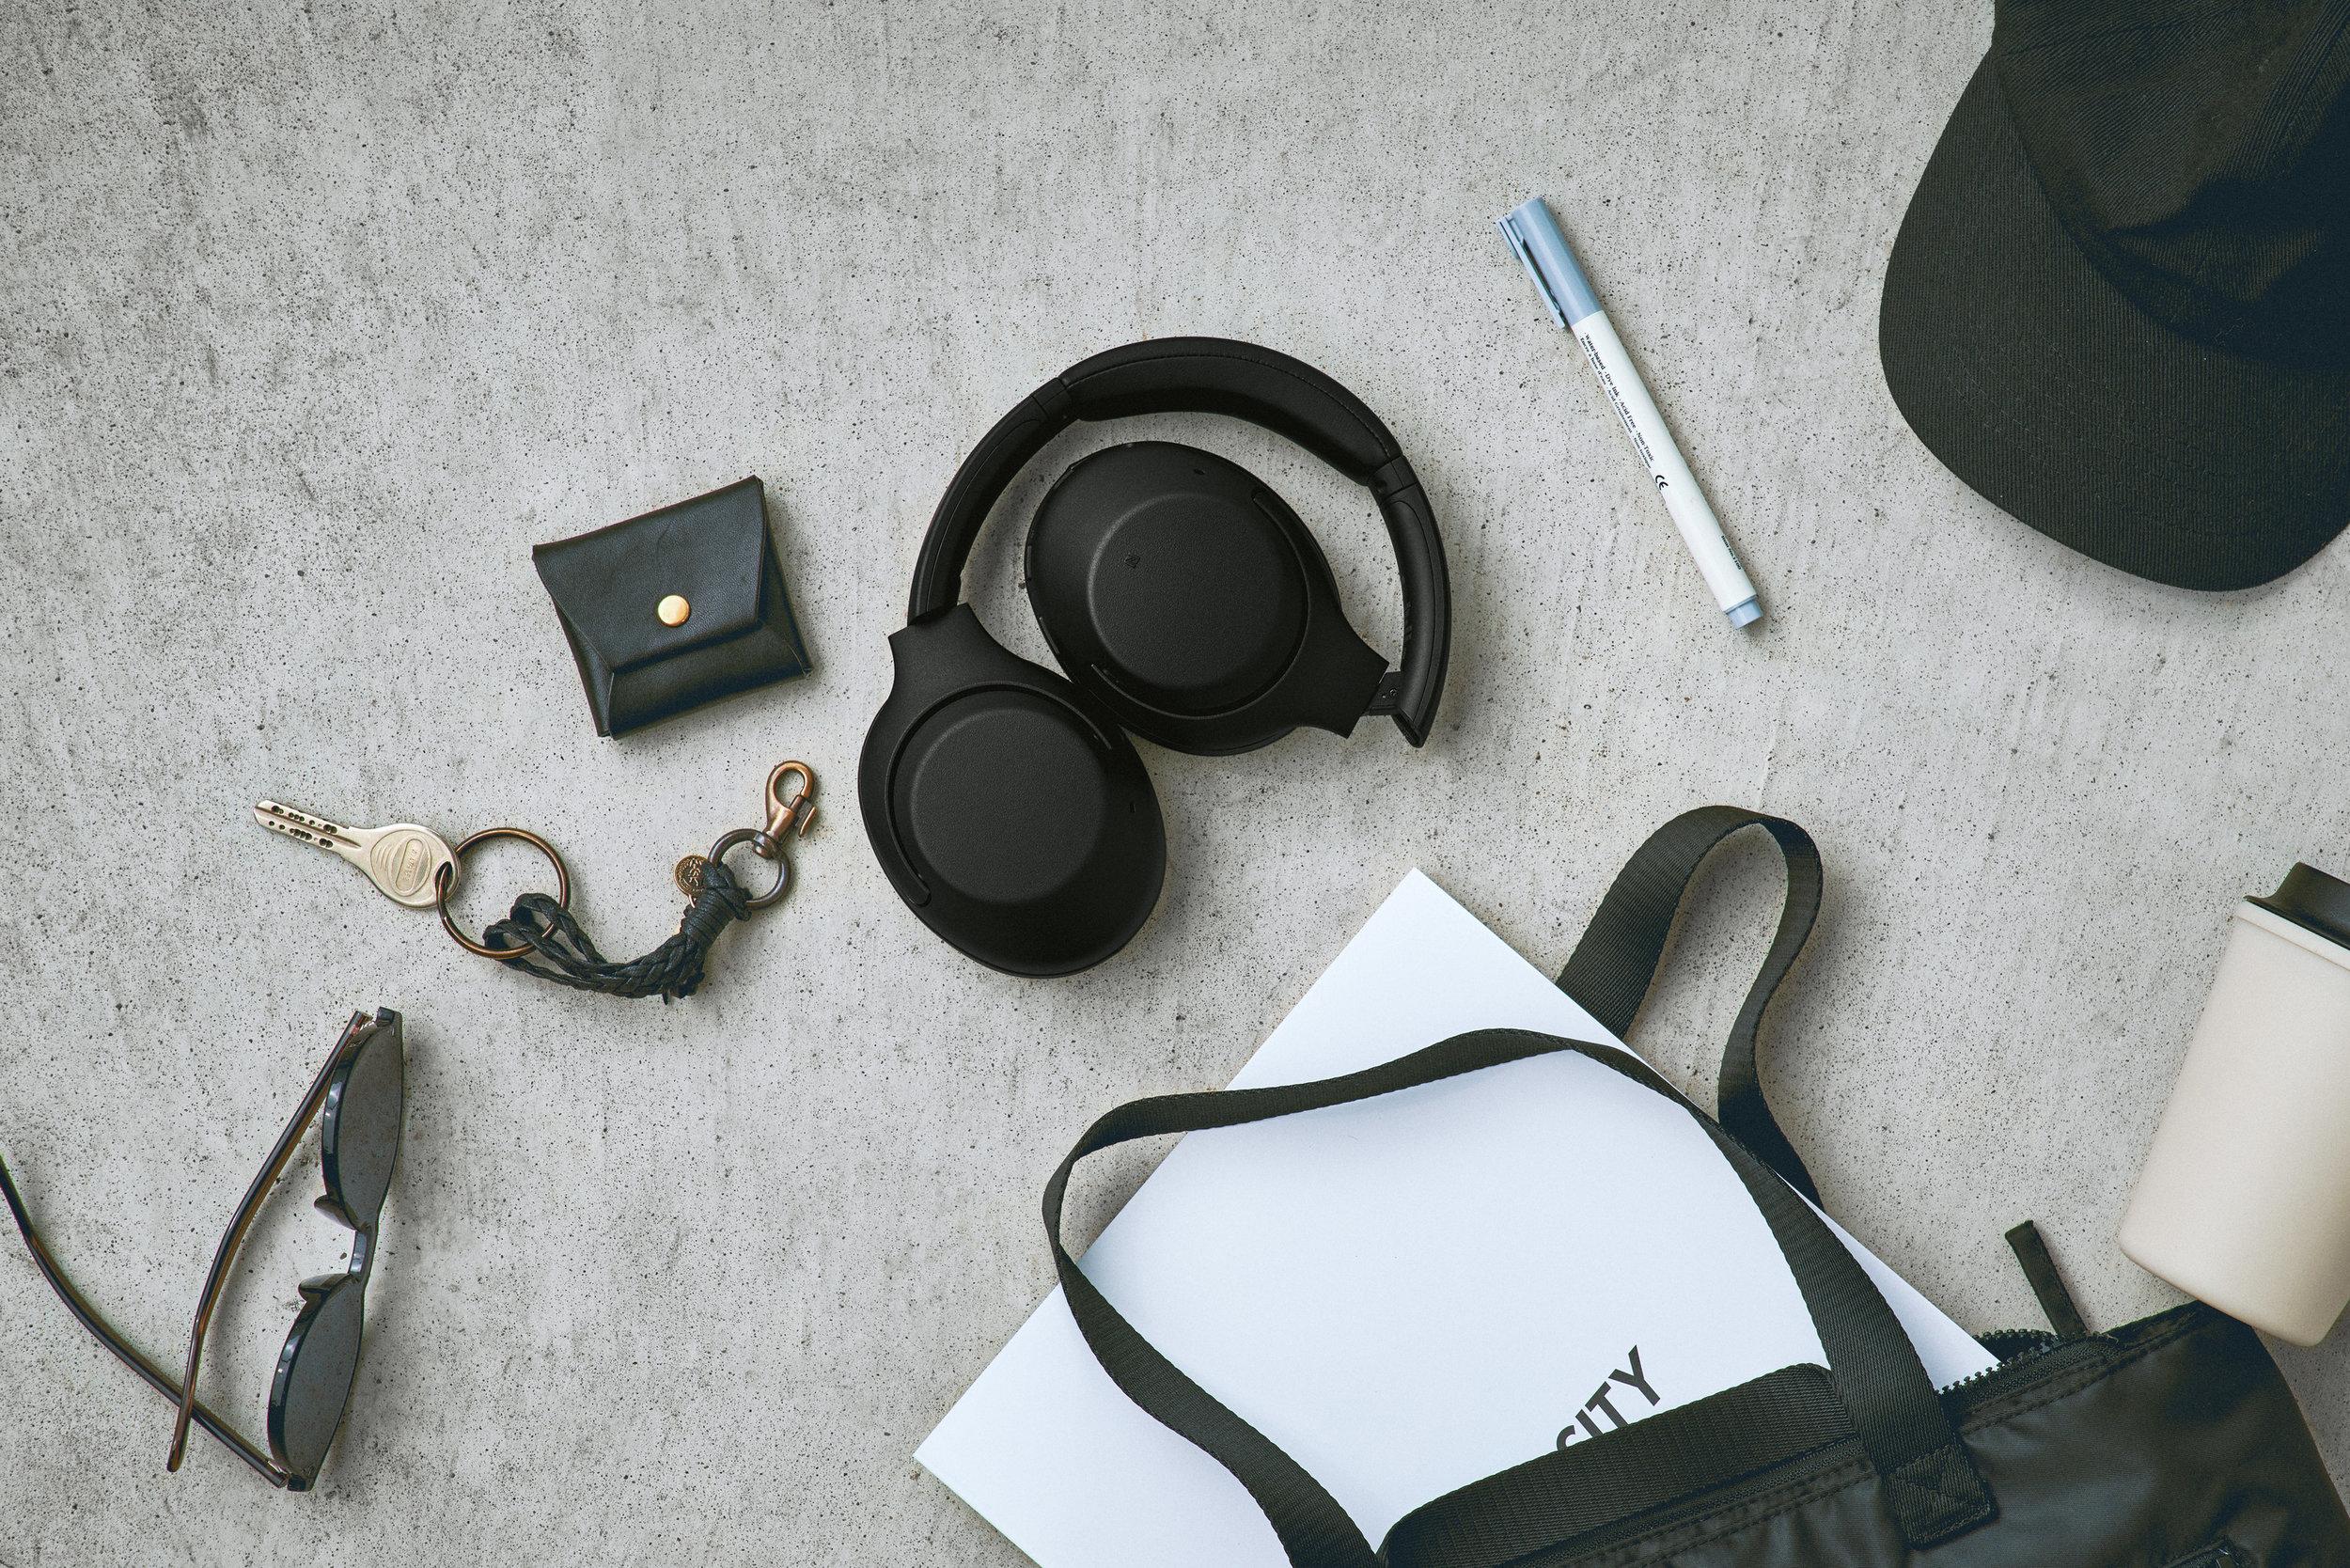 Sony_WH-XB900N_Schwarz_Lifestyle_02.jpg